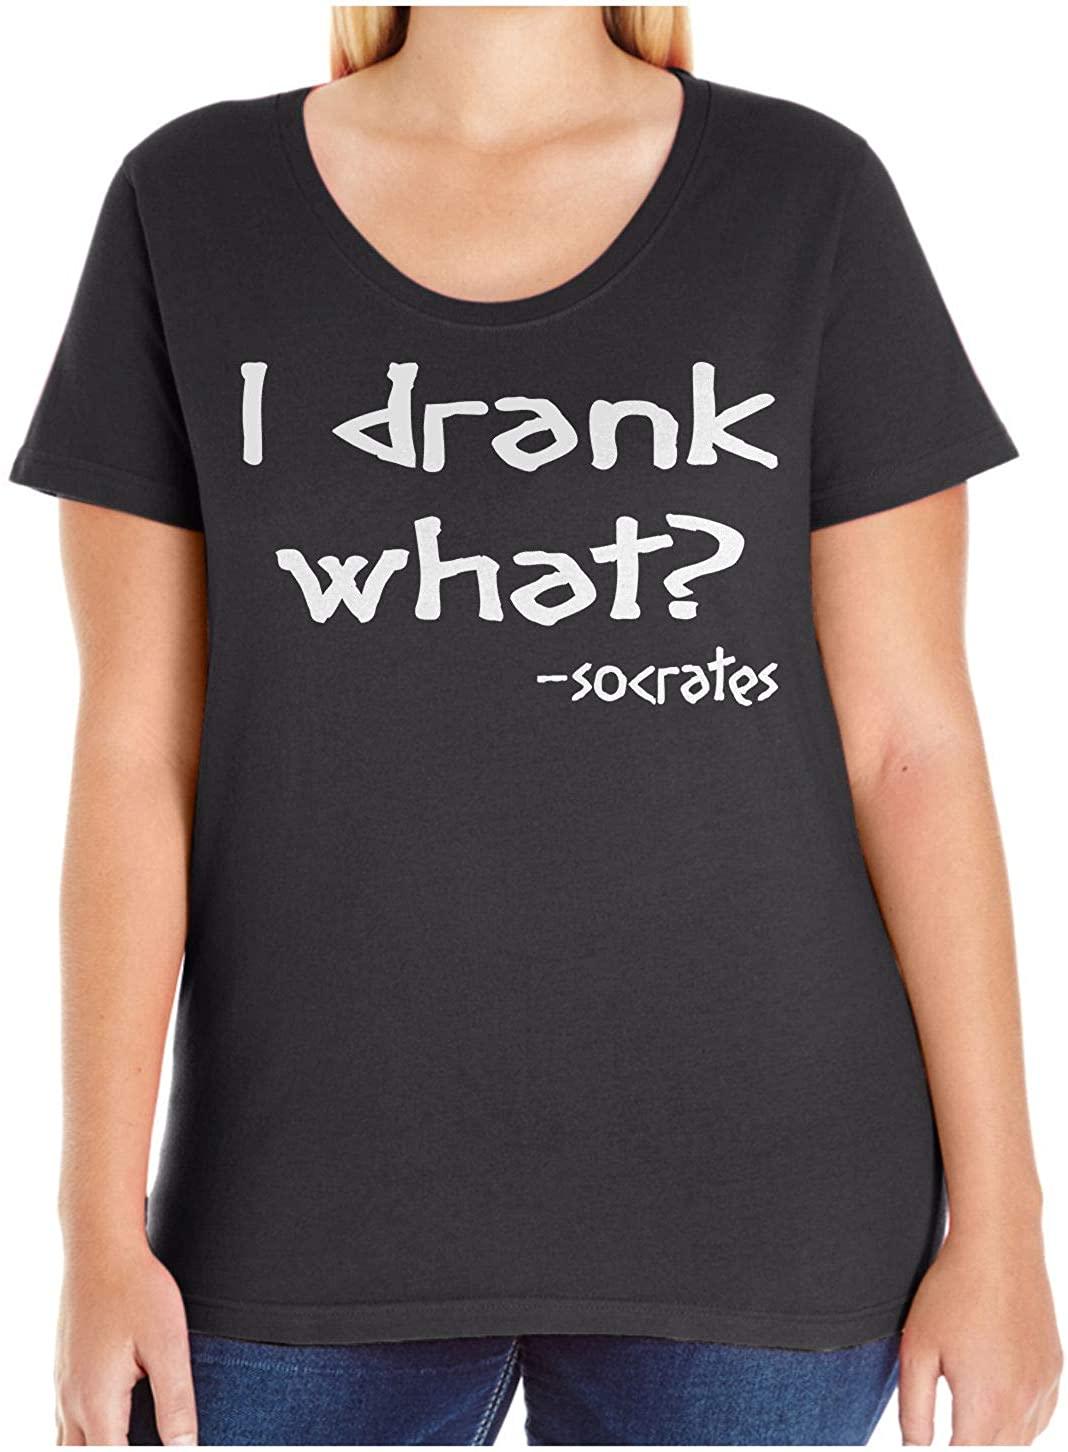 HARD EDGE DESIGN Women's I Drank What (Socrates) Plus Size Scoop Neck T-Shirt, Size 1, Black